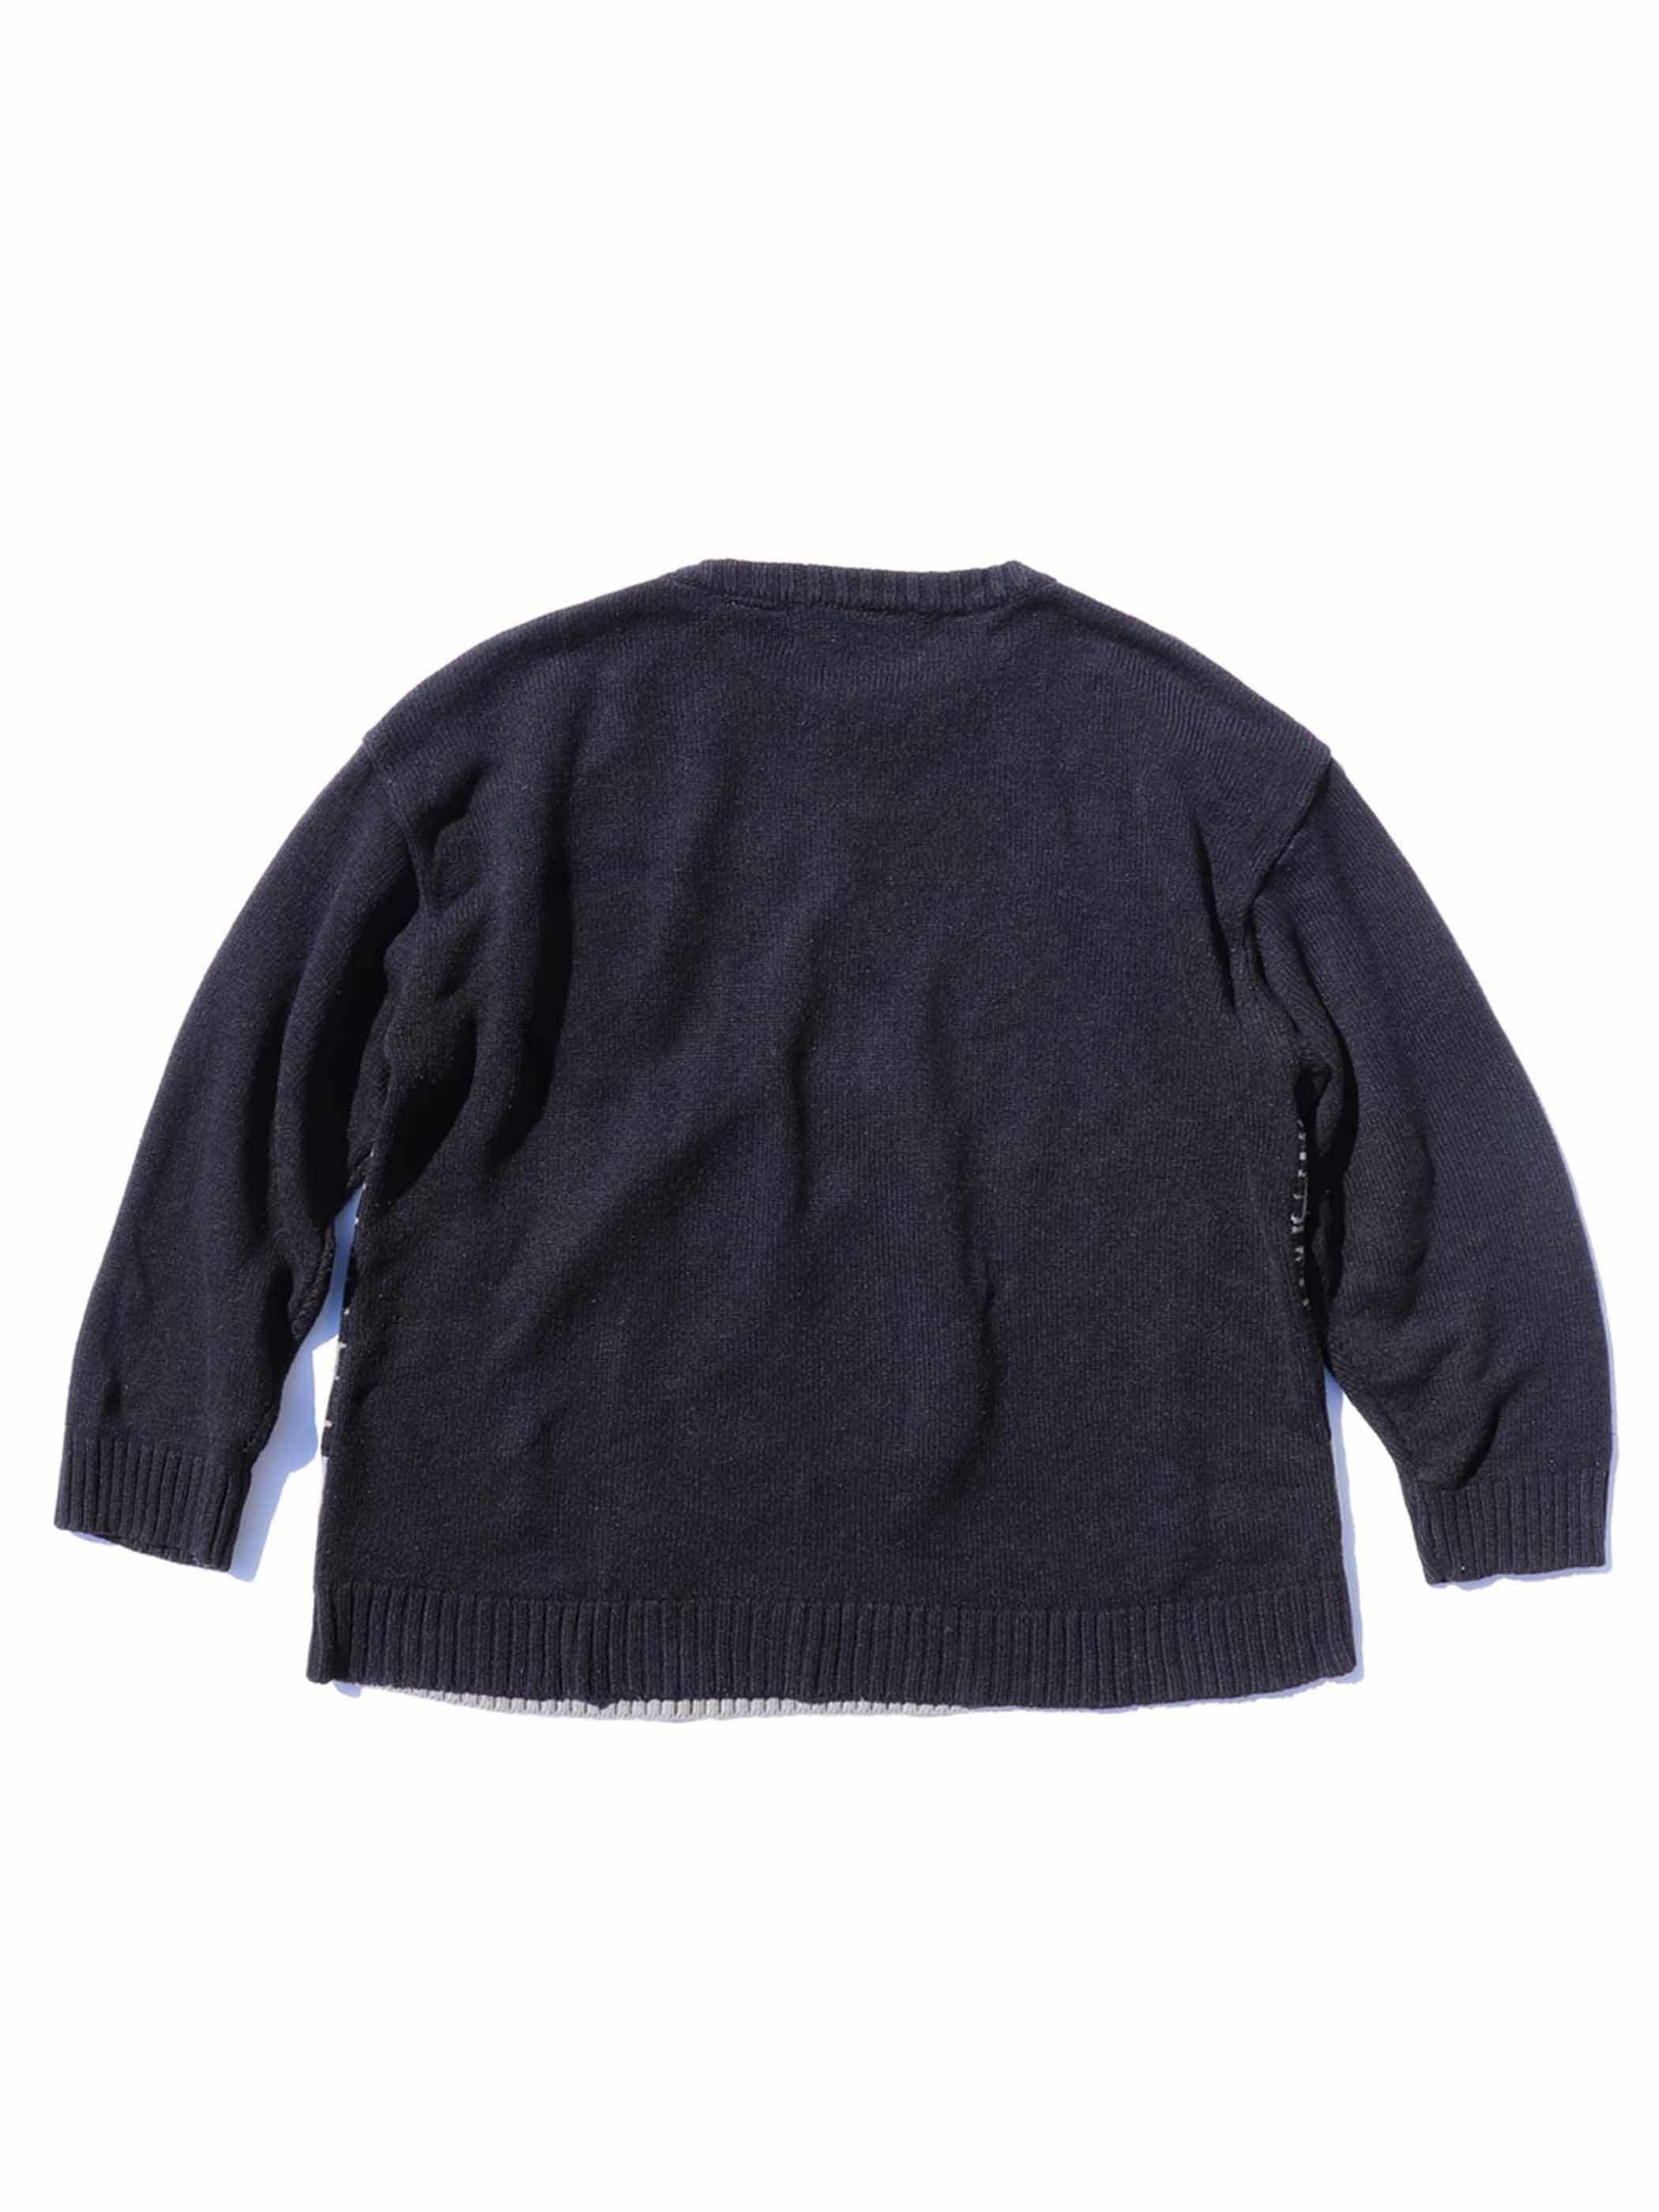 80's~ BEYOND THE LIMIT フェルトパッチ刺繍 ジャガードニット [XL]